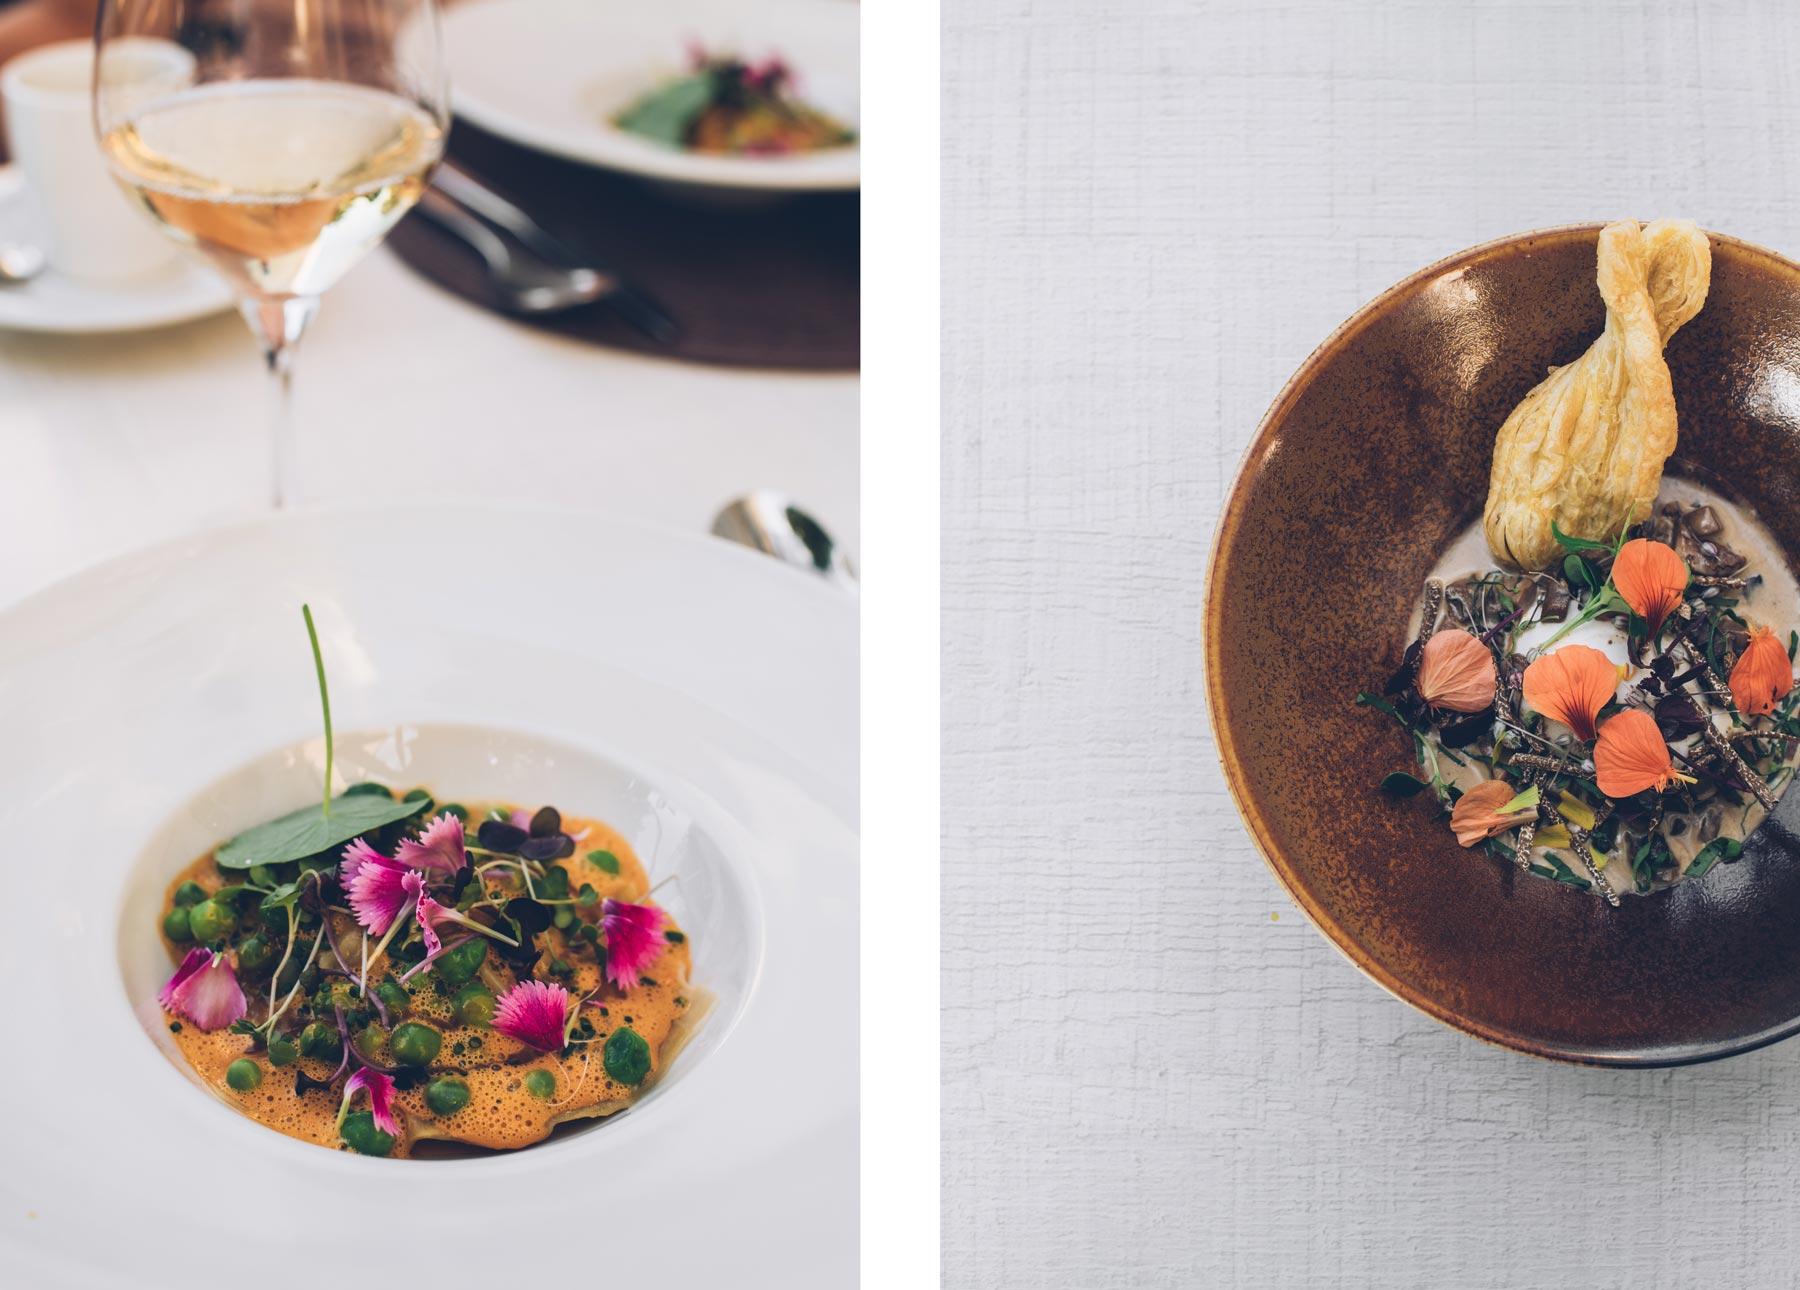 Les Sens, Meilleur Restaurant de Tarn et Garonne